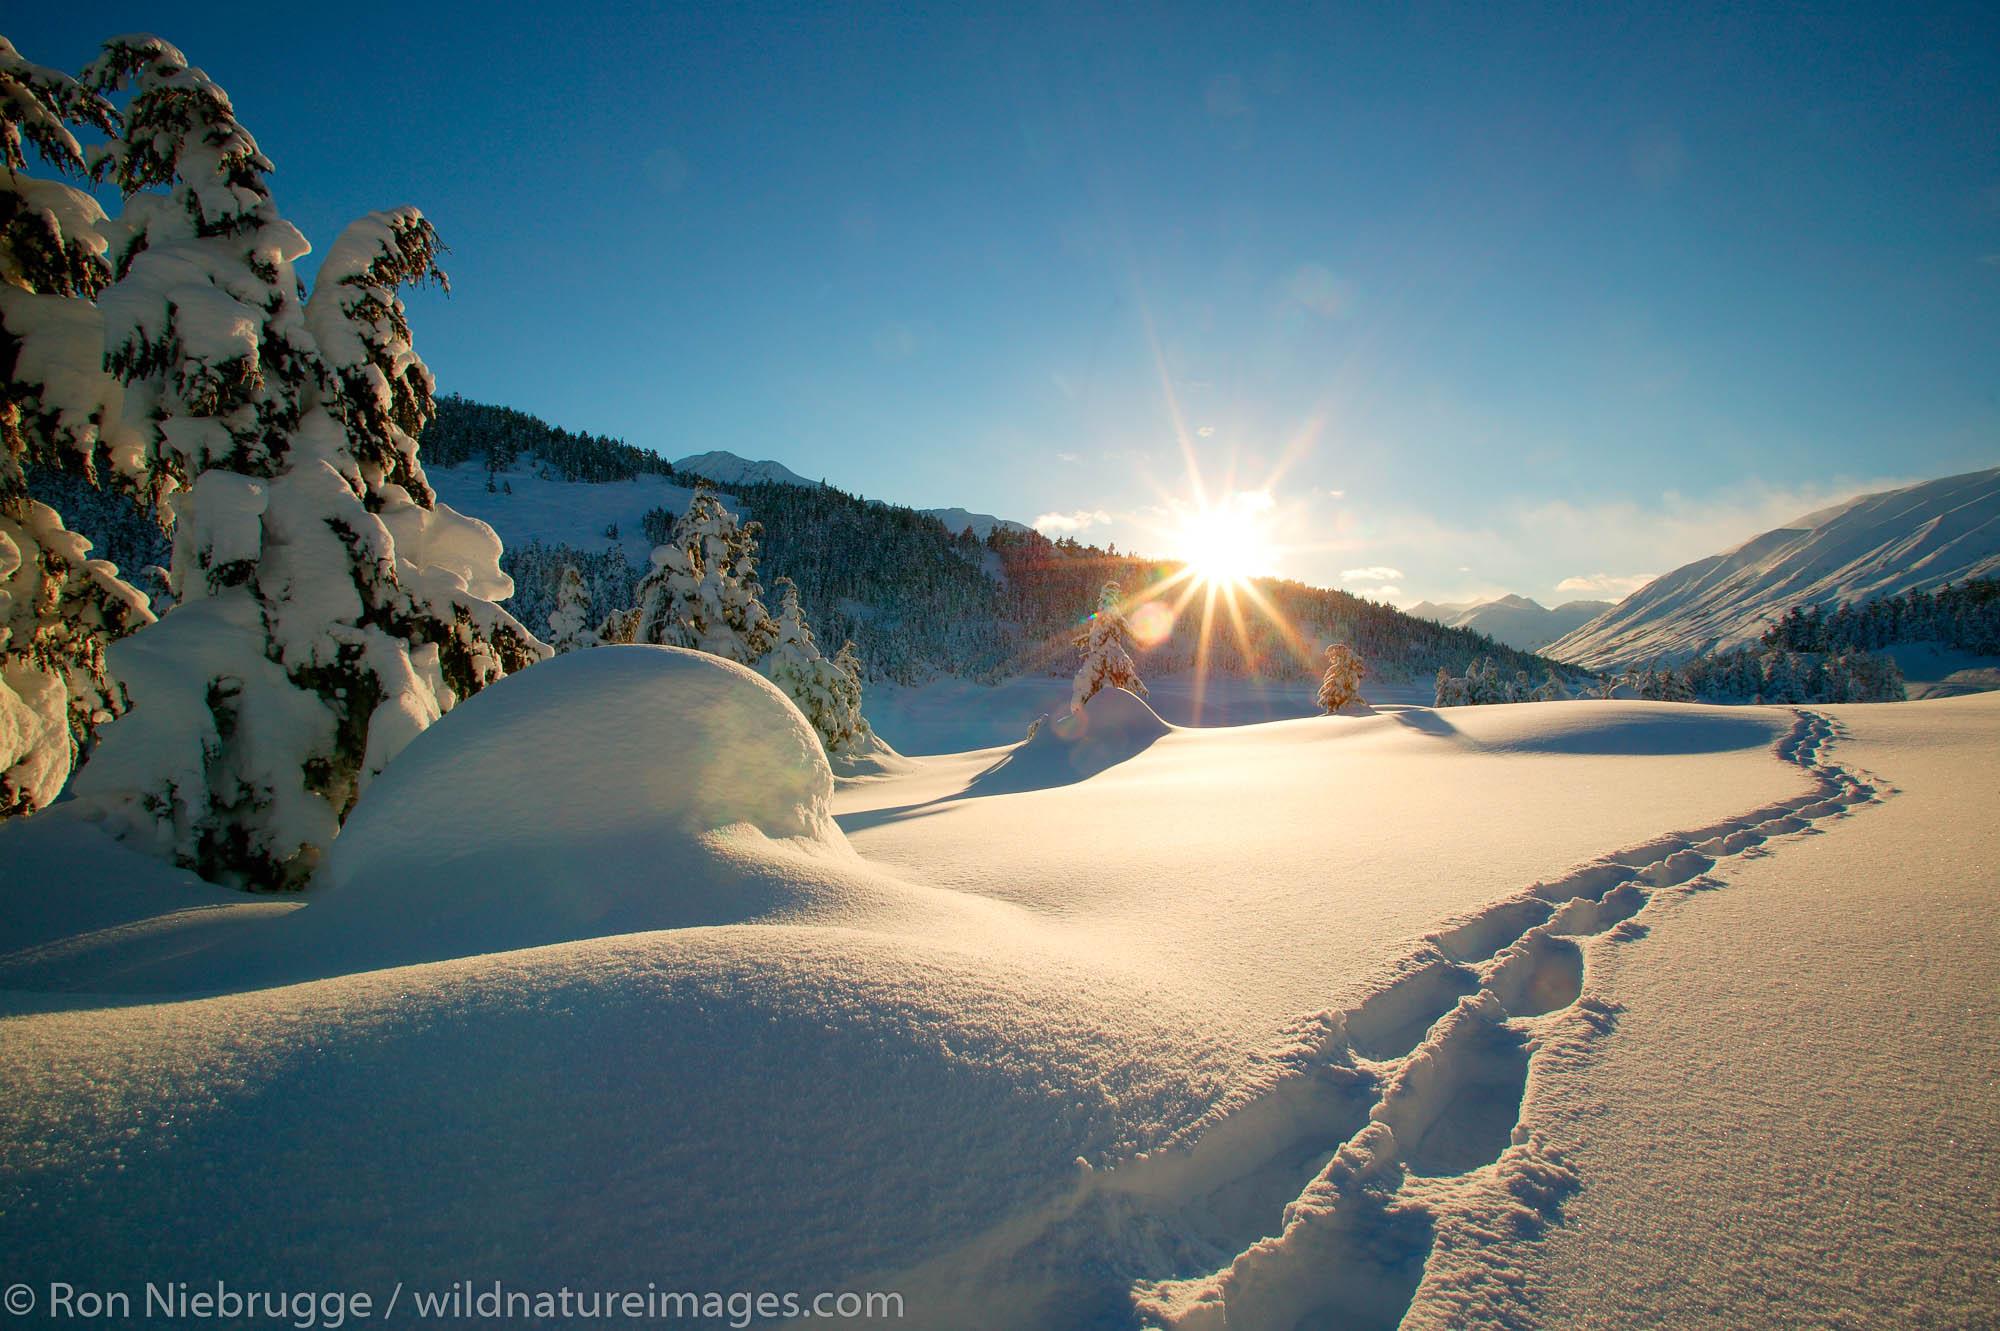 Snowshoe tracks in the snow, Chugach National Forest in the winter, Turnagain Pass, Kenai Peninsula, Alaska.